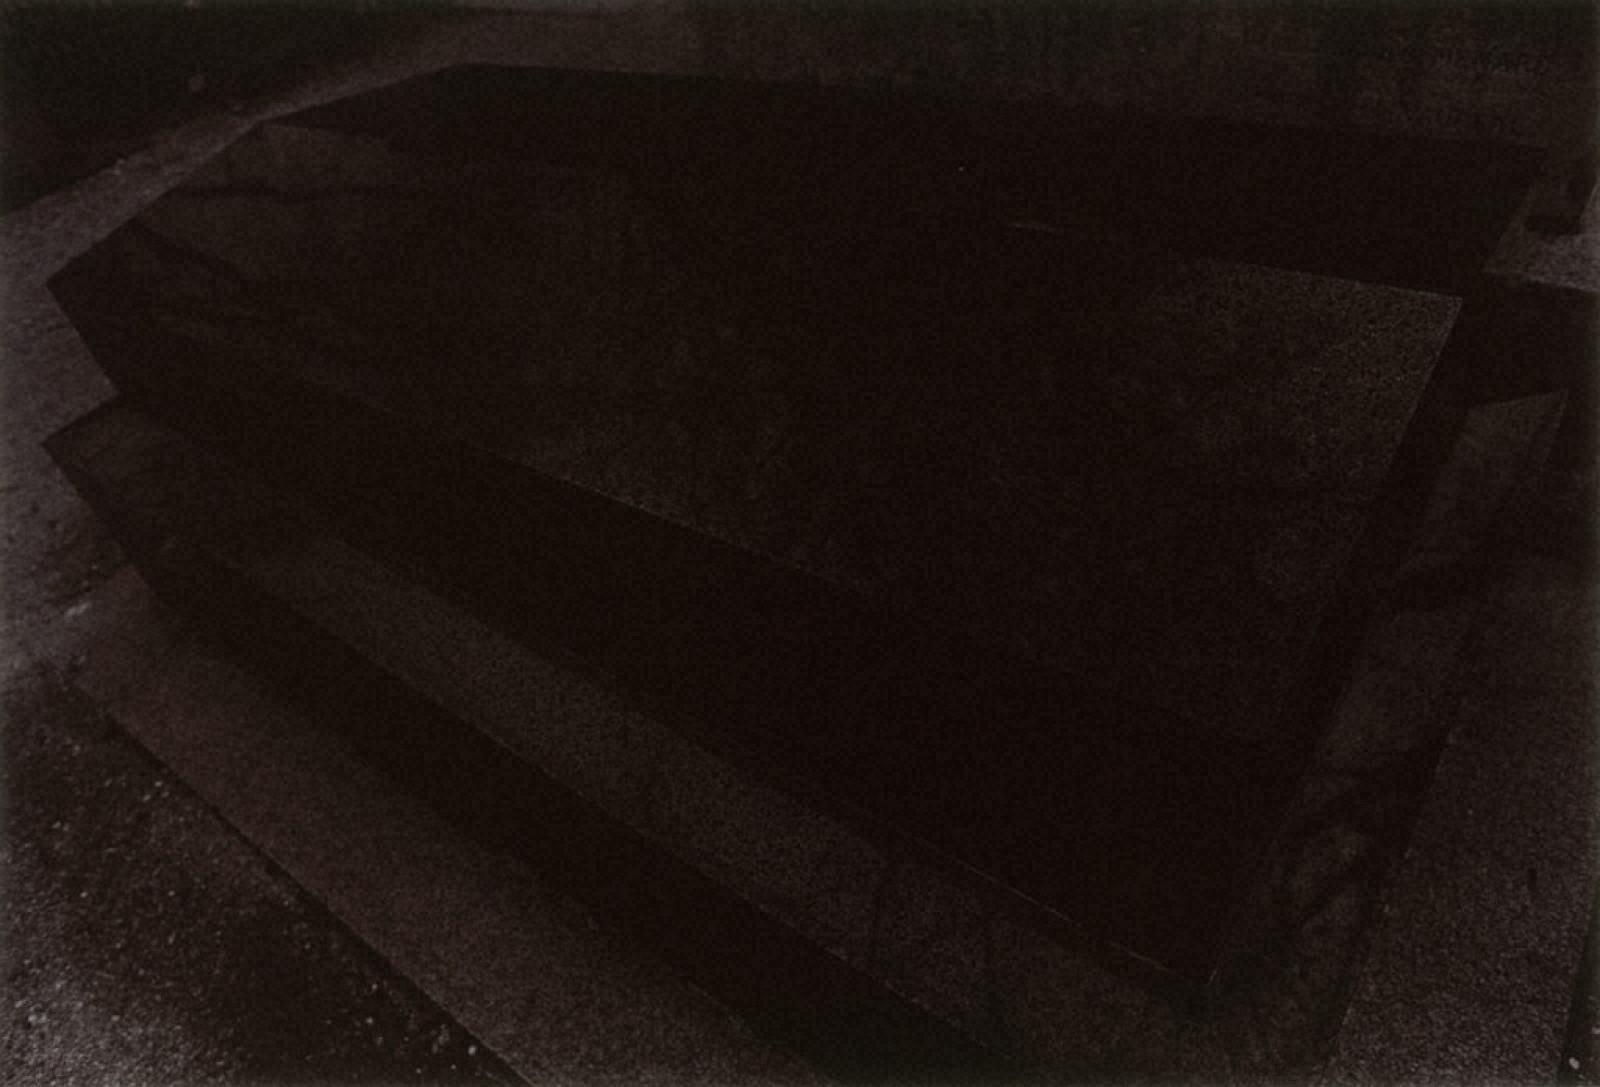 [Jun SHIRAOKA Photographs 1970-1998]フランス、パリ(モンマルトル墓地)、1973年2月